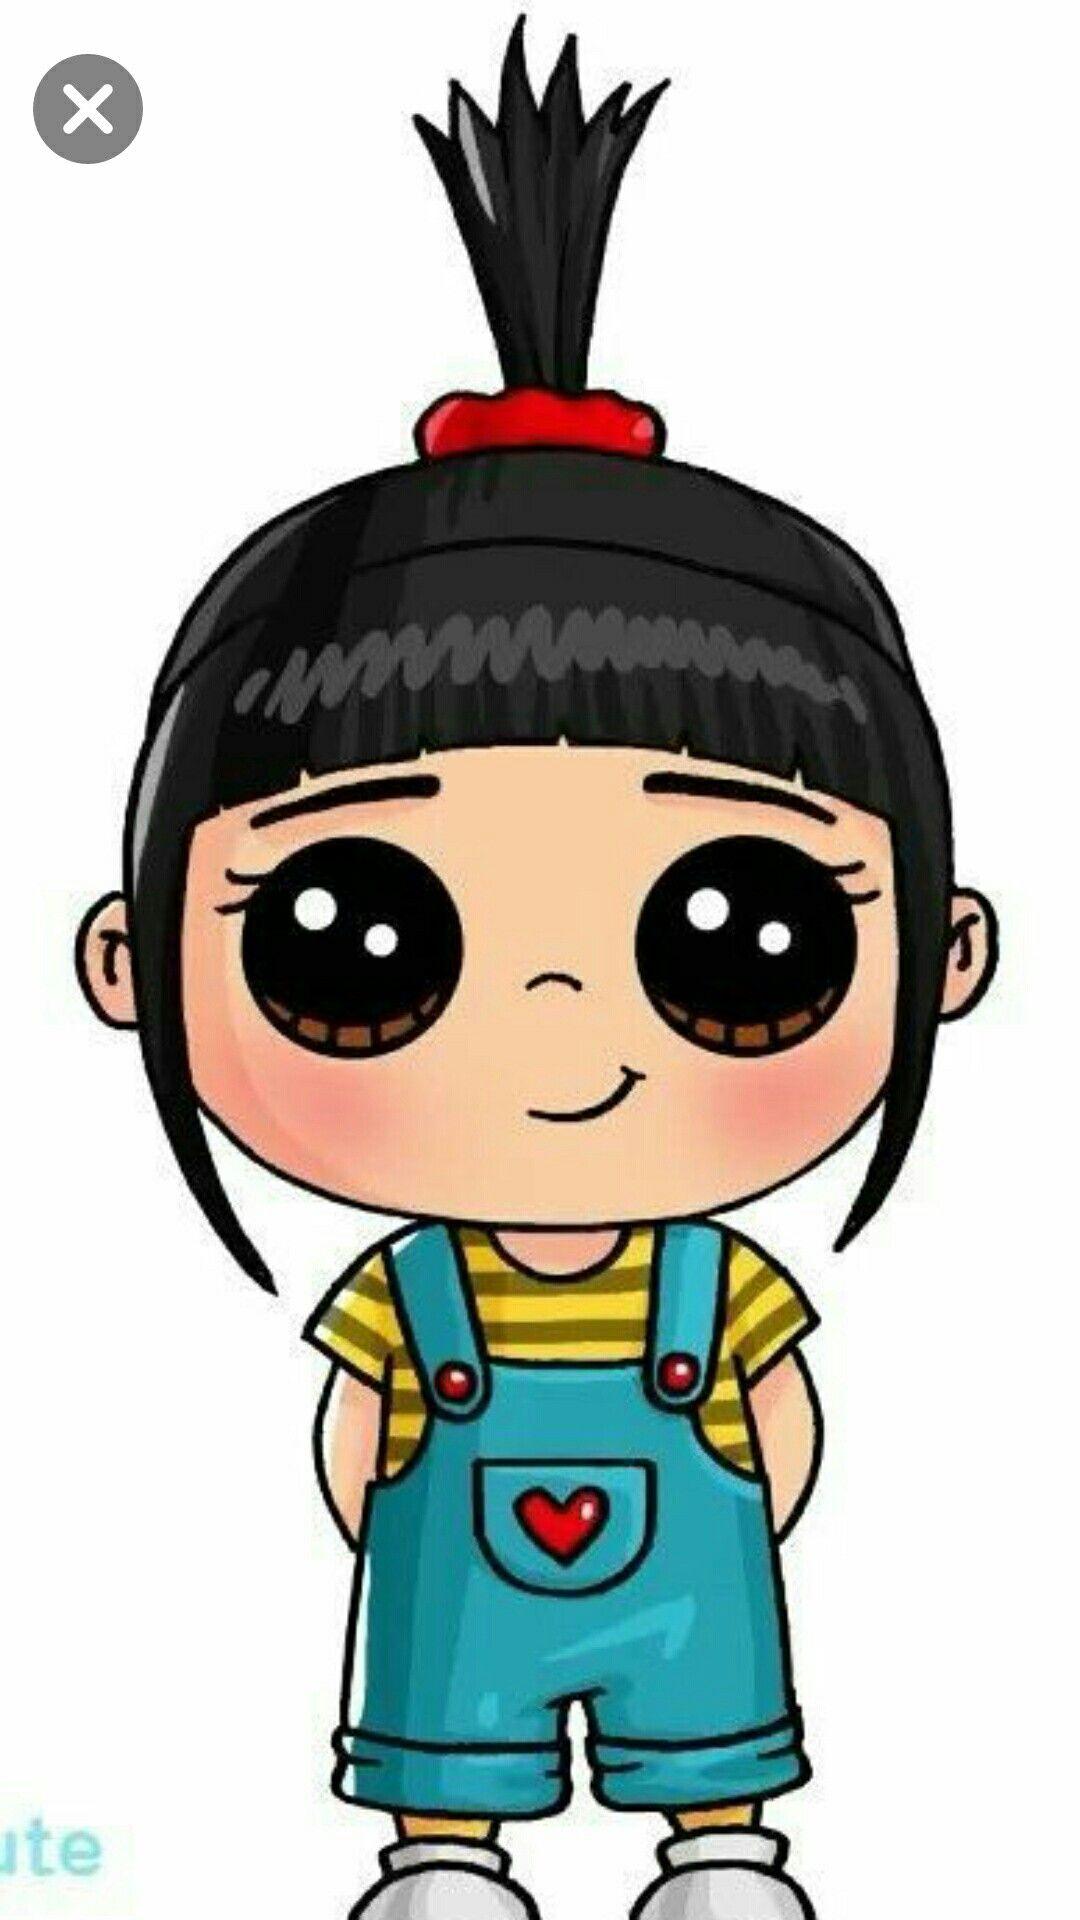 Pin by Fienka R M Mastantio on Cartoon | Cute kawaii ...